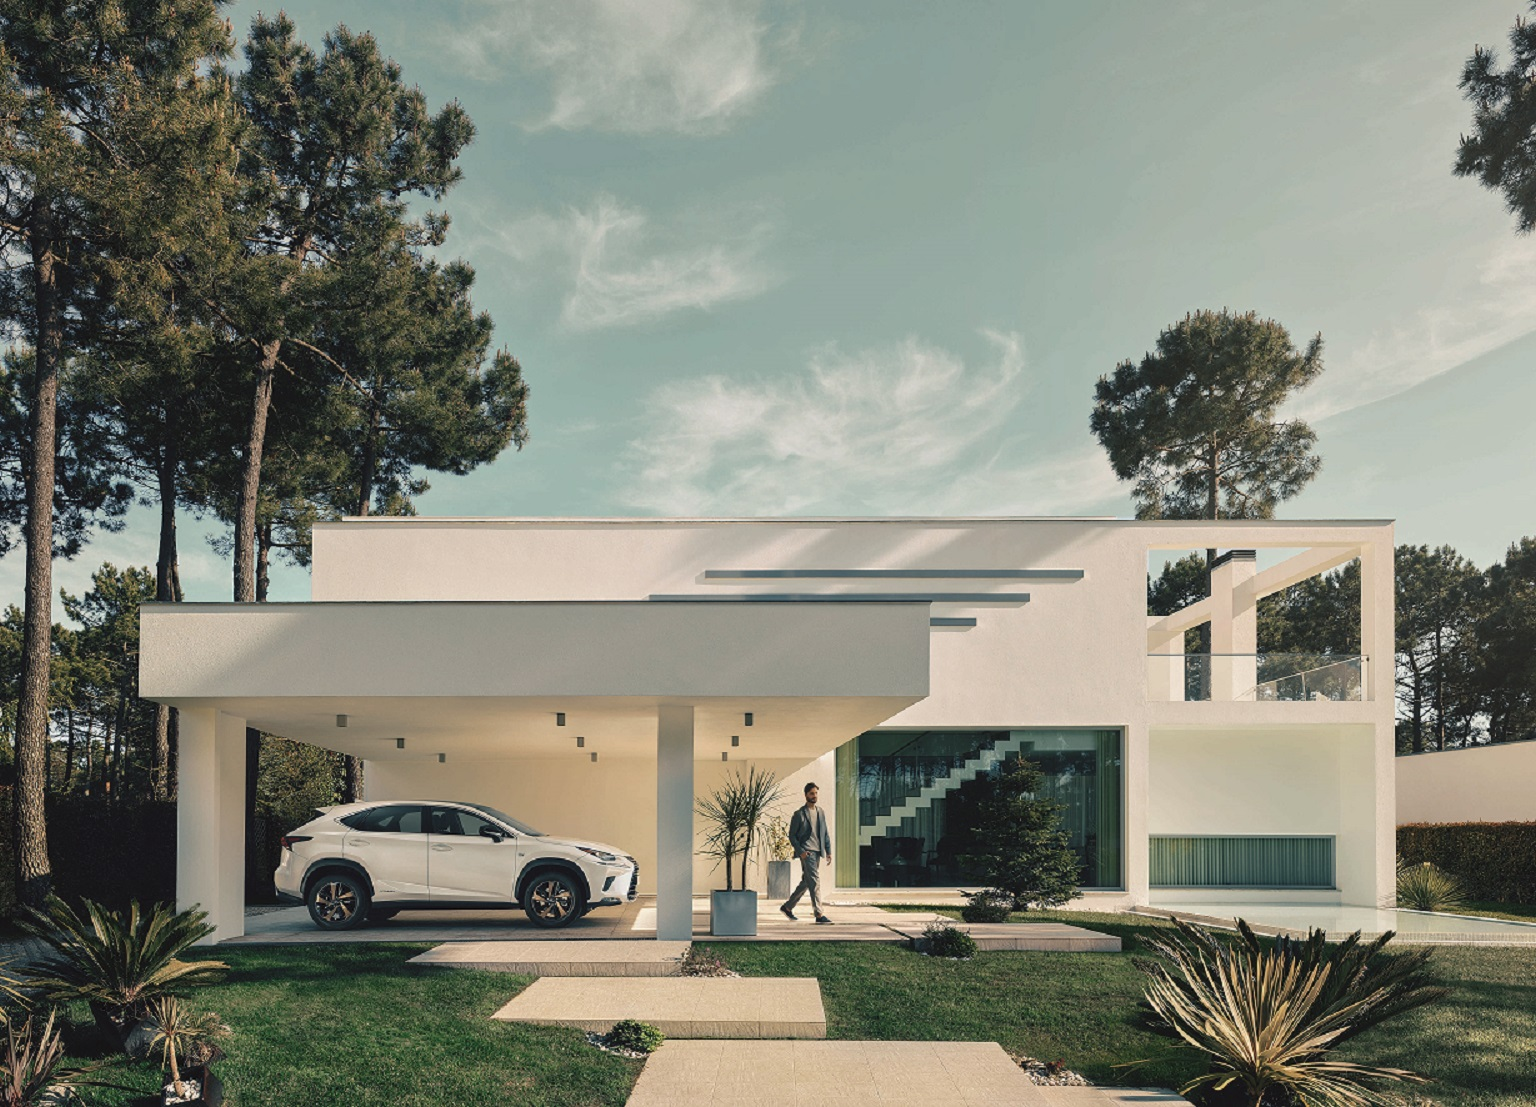 2018 Lexus NX House Side Profile SL